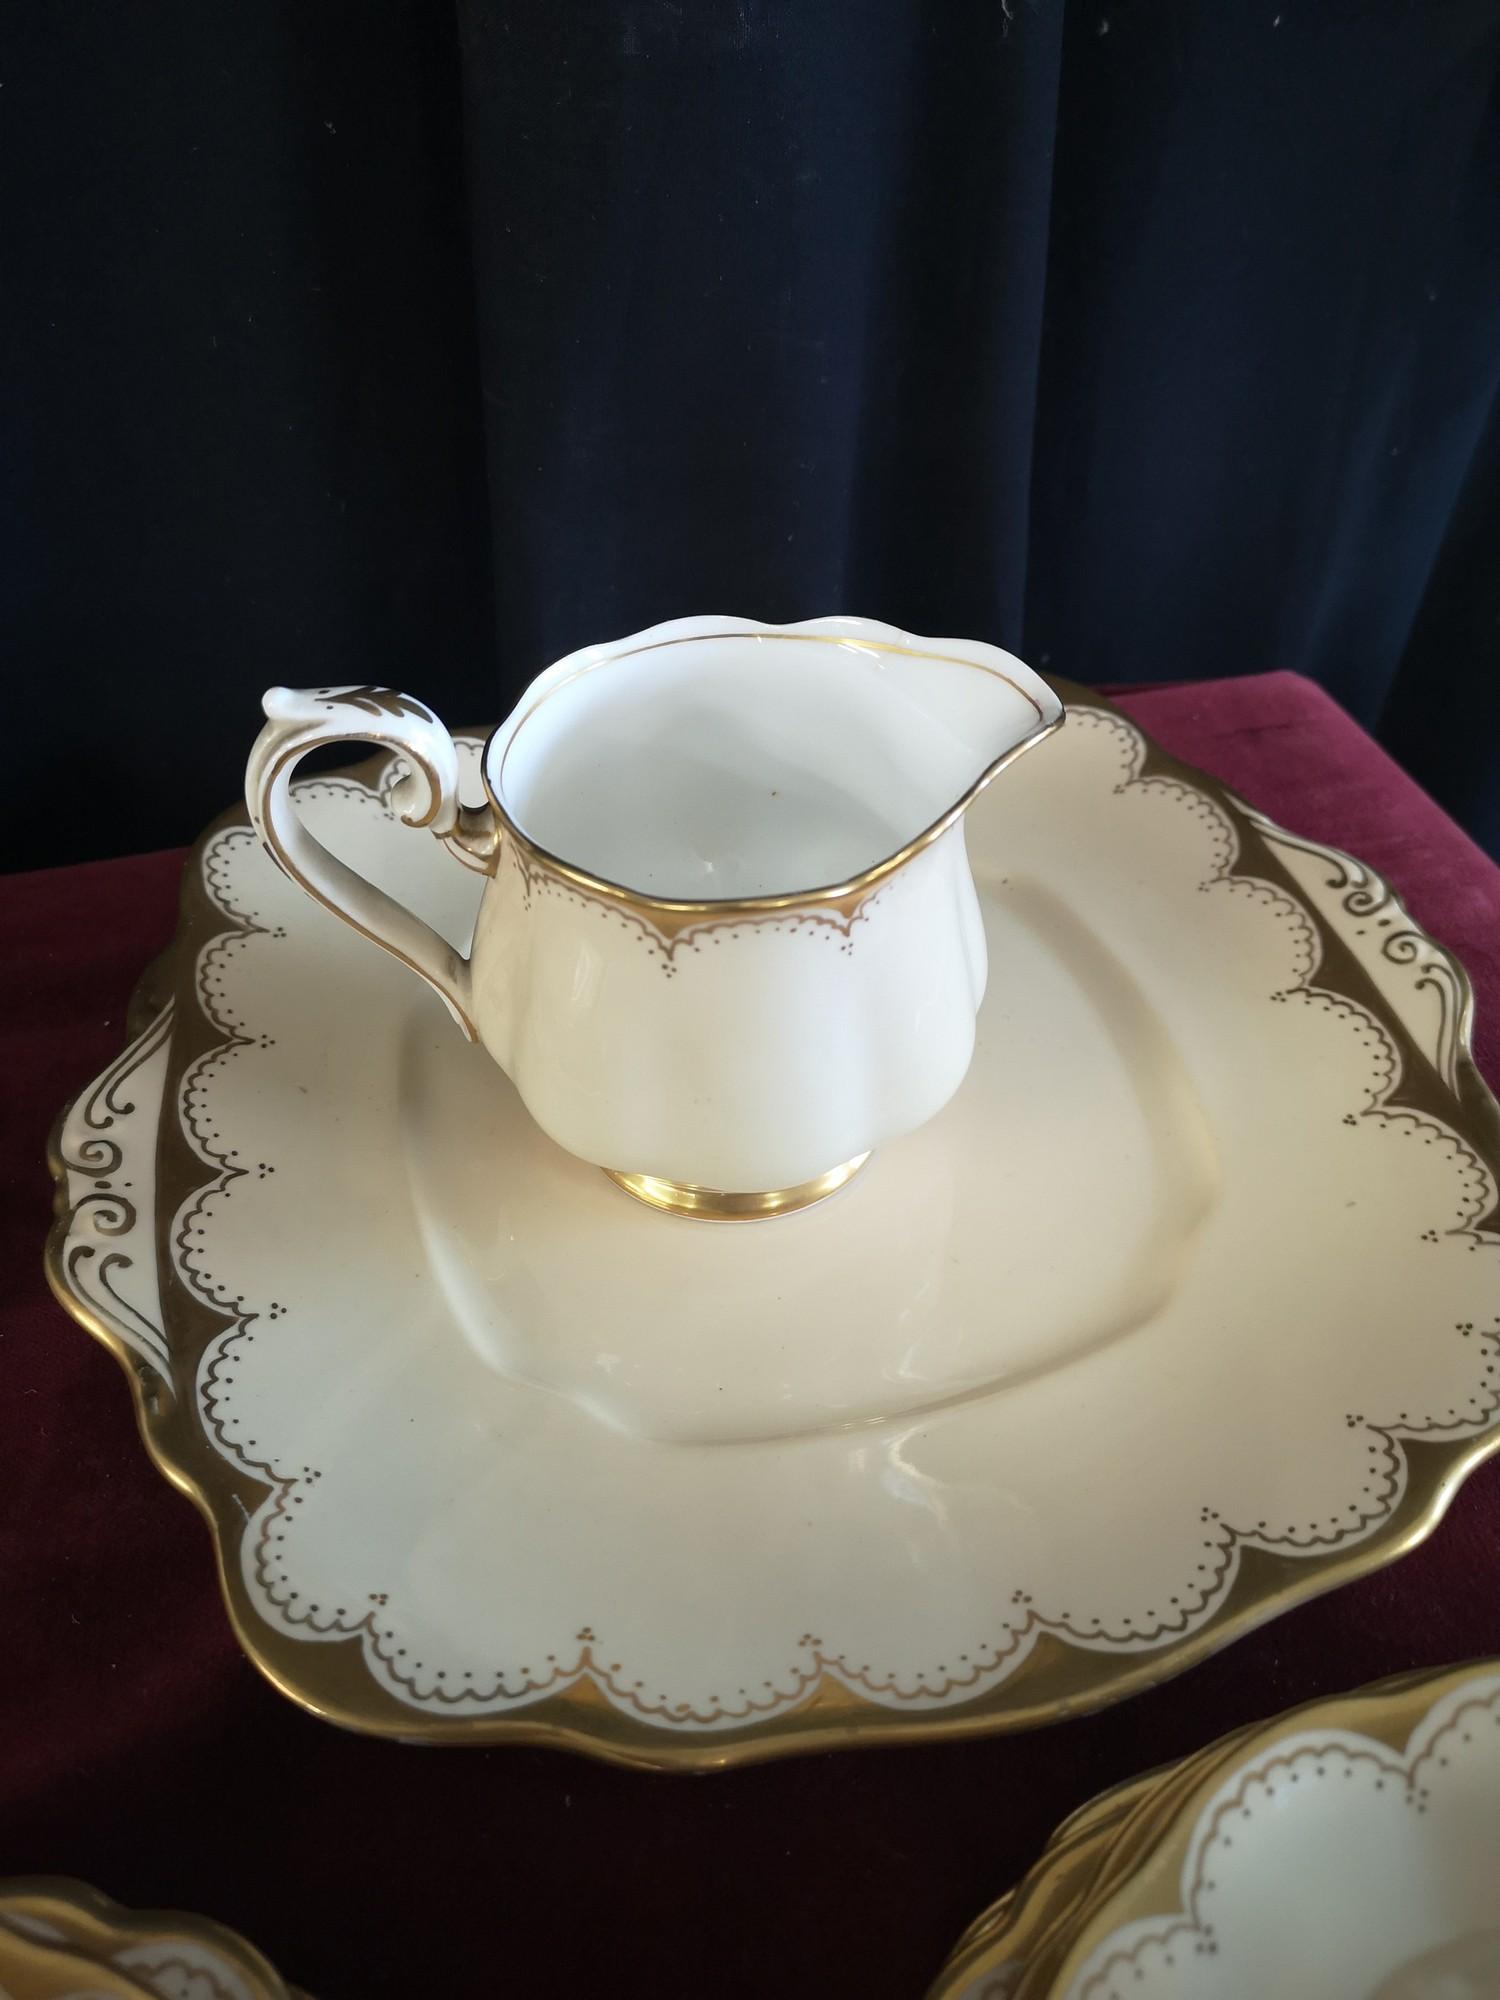 Large 1900s Royal Albert gilt tea set, set in cream back ground. - Image 3 of 10